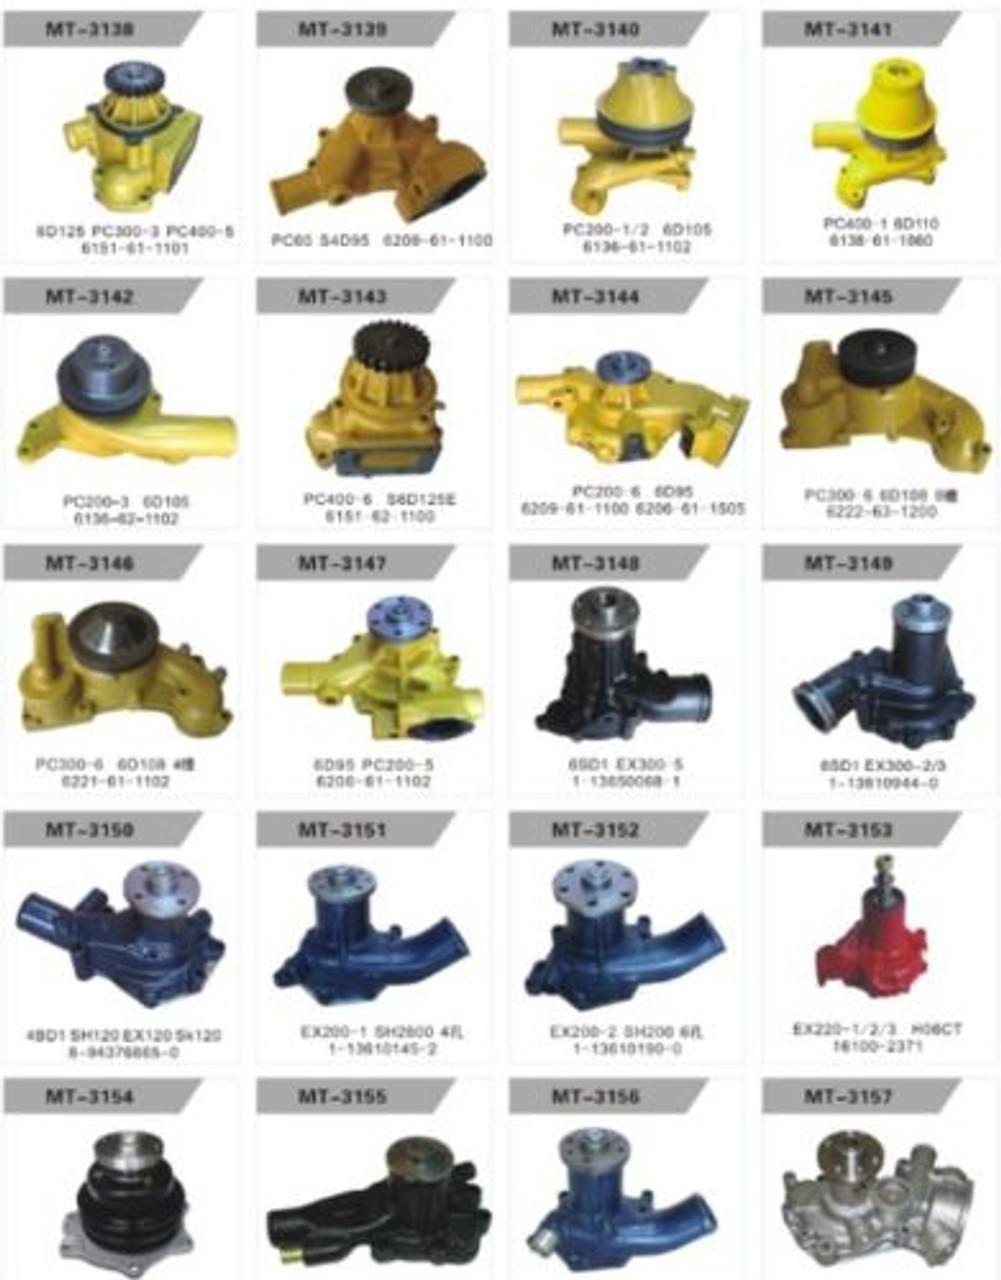 6735-61-1500 WATER PUMP FITS KOMATSU 6D102 S6D102 PC200-6 PC200-7 PC220-7 PC220